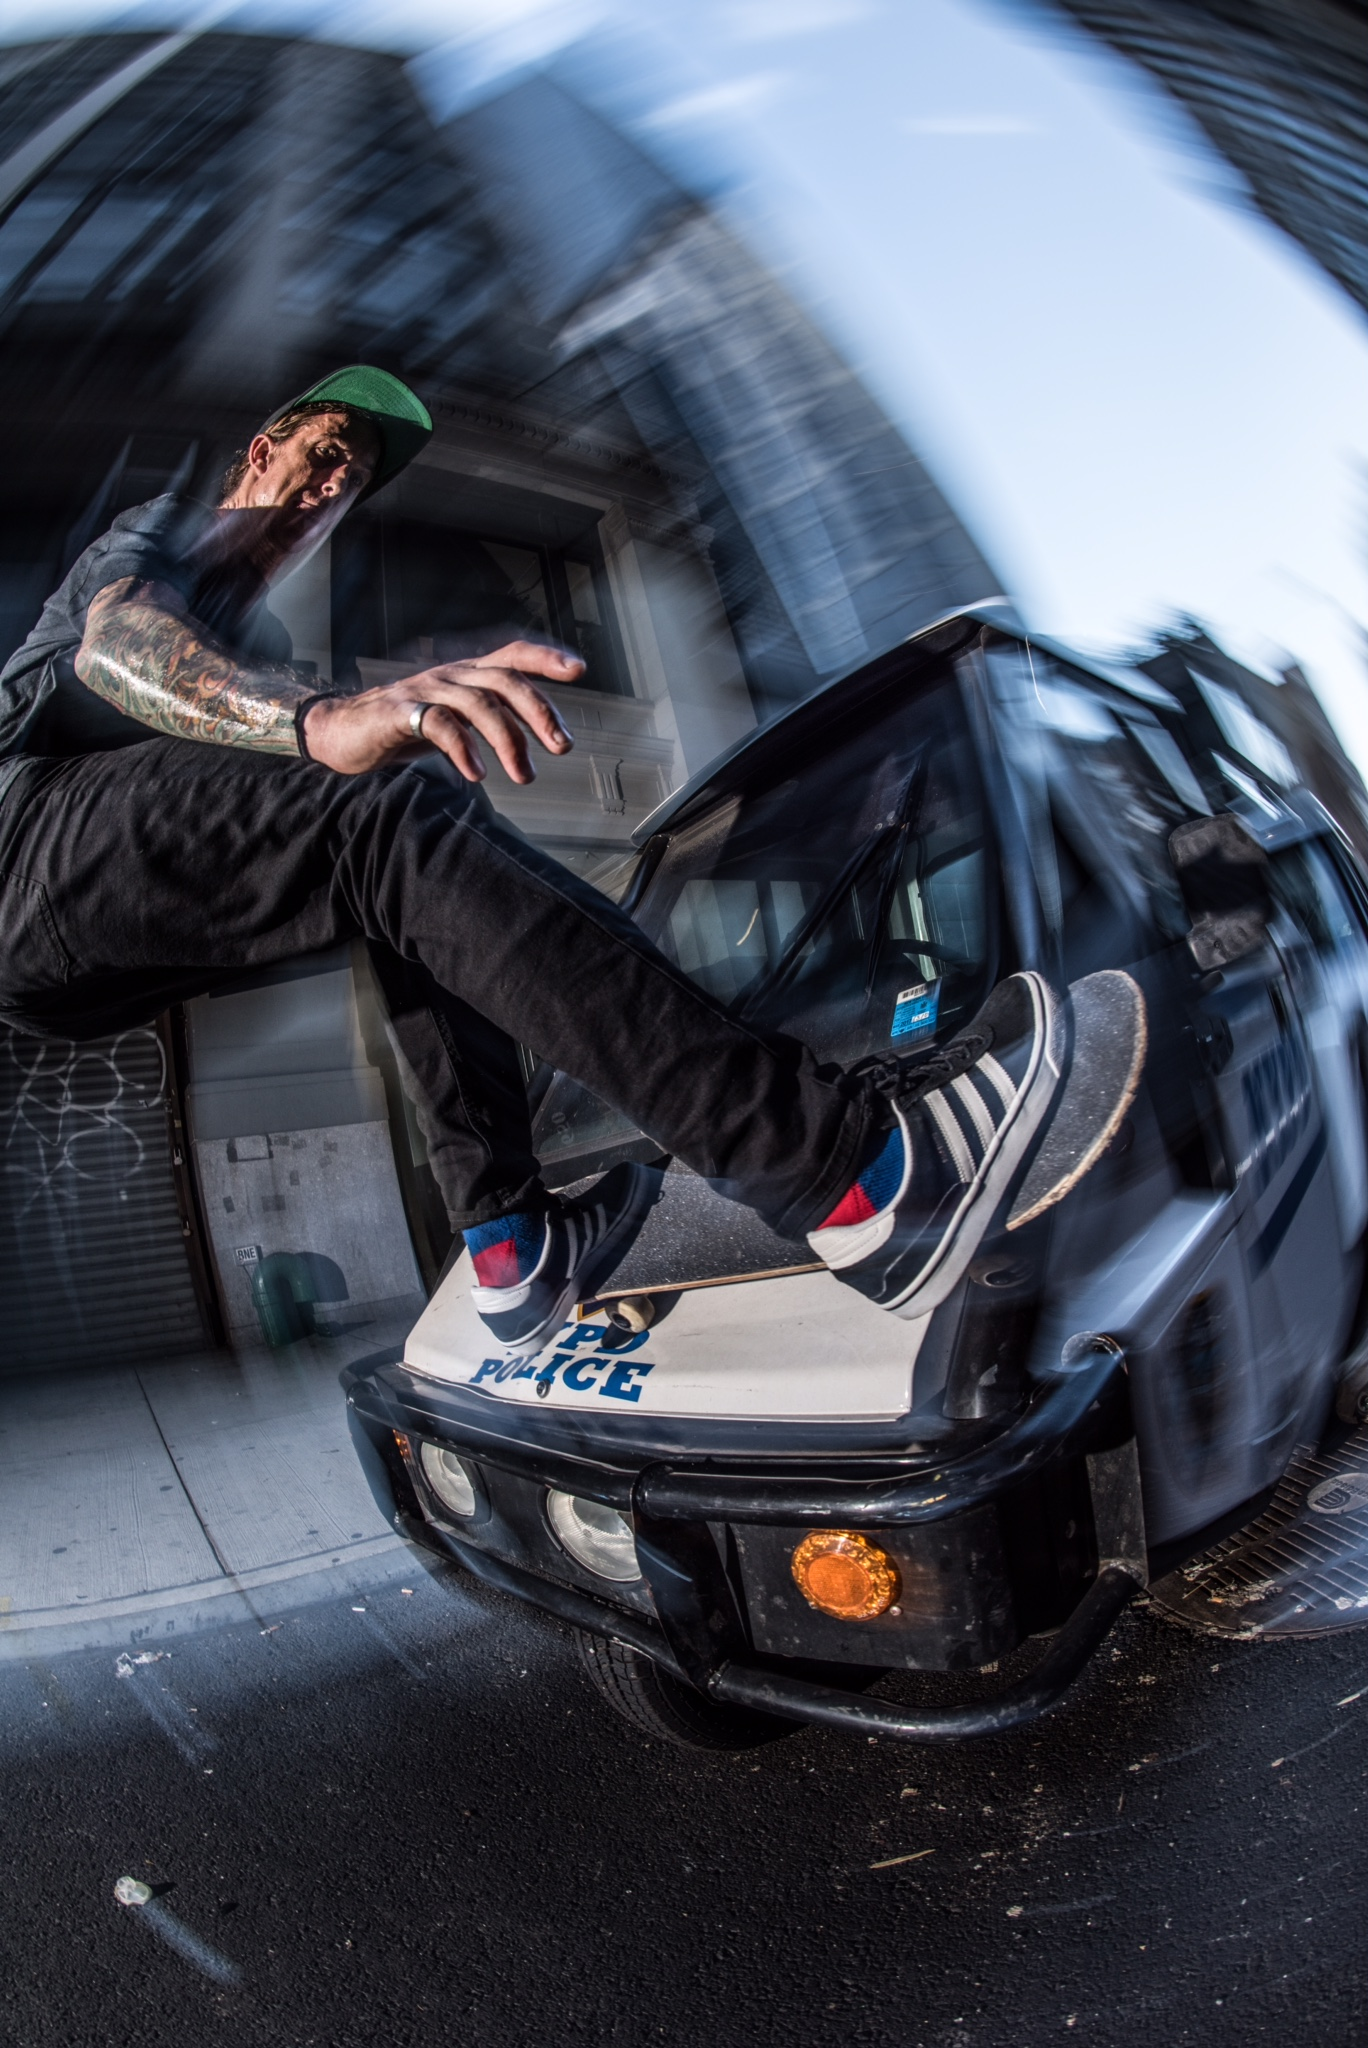 Chris Jata - Police buggy ride / Photo: J-Hon